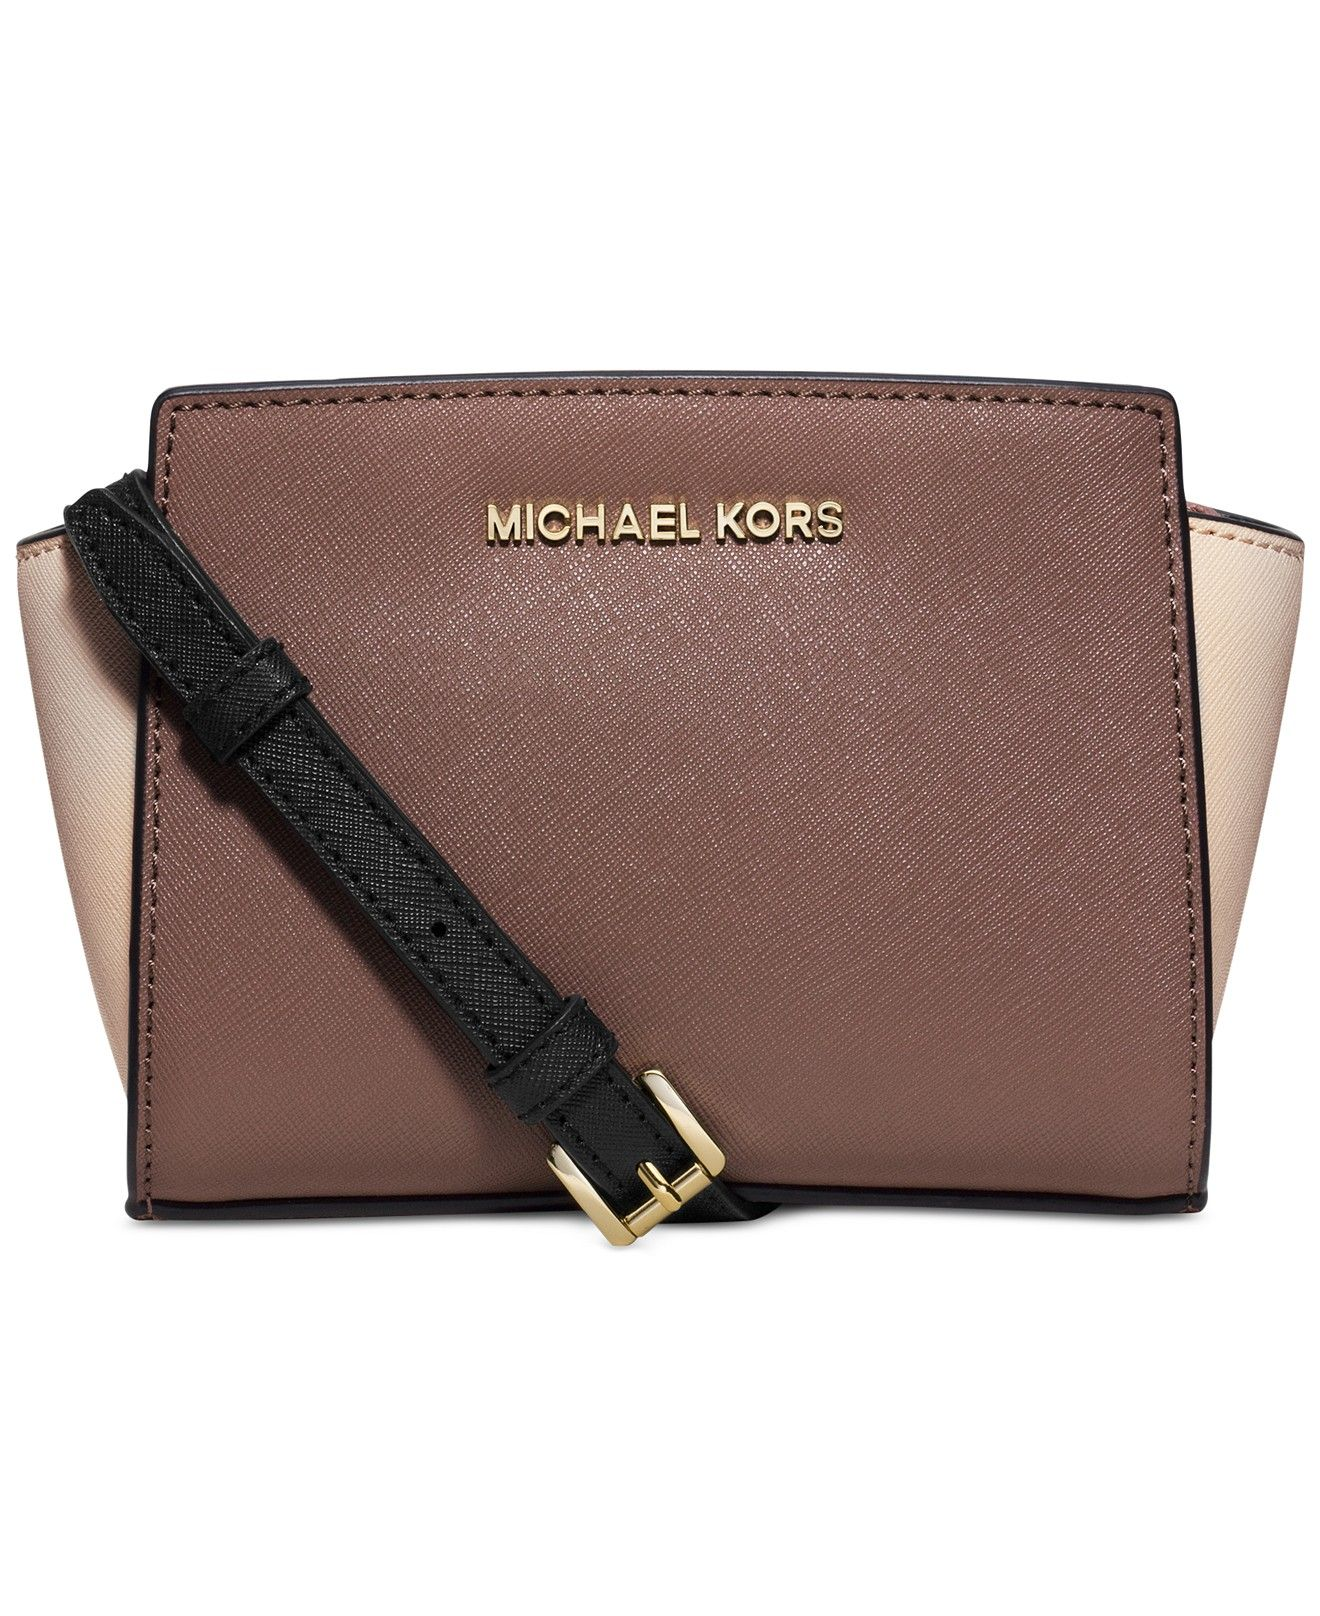 73c9ee855f09 ... in classic saffiano leather. MICHAEL Michael Kors Selma Mini Messenger  Bag - MICHAEL Michael Kors - Handbags & Accessories - Macy's